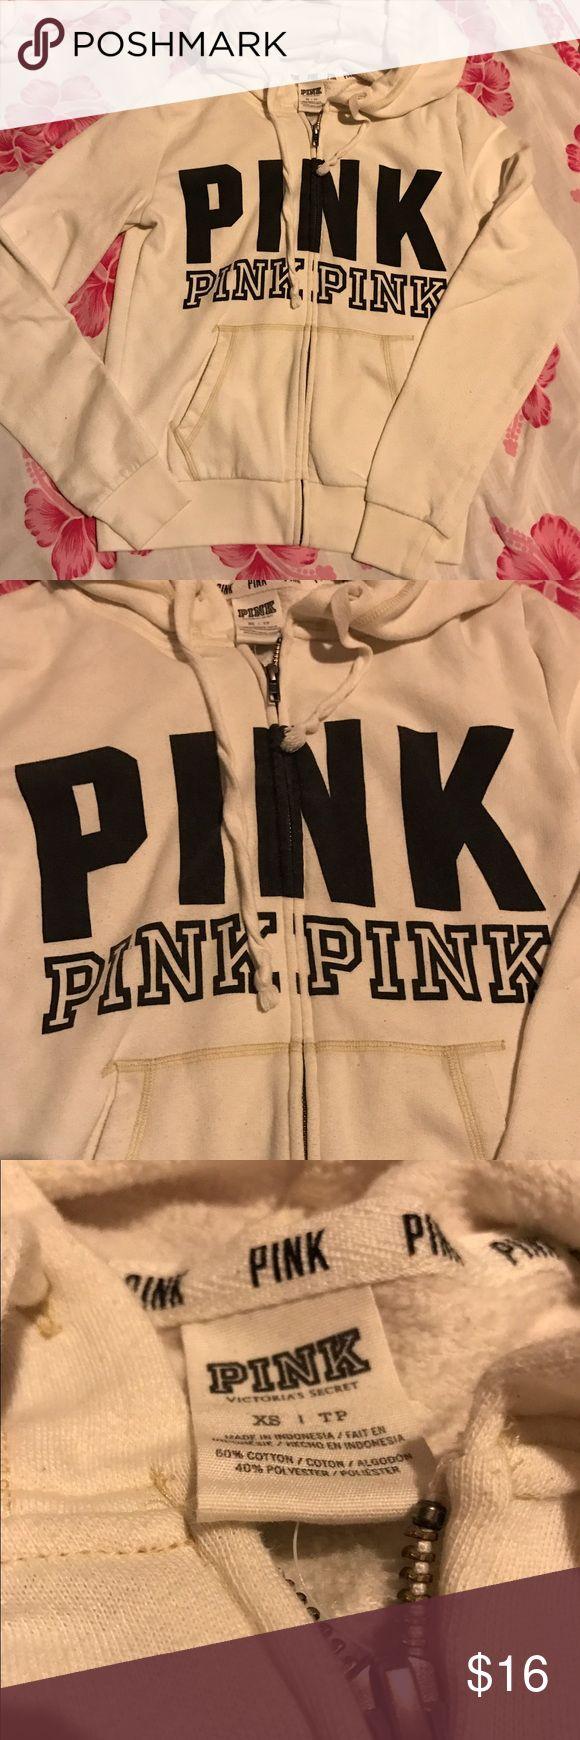 VS PINK X Small Hoodie Zip Up Cream Good condition. Pilling as pictured. PINK Victoria's Secret Tops Sweatshirts & Hoodies